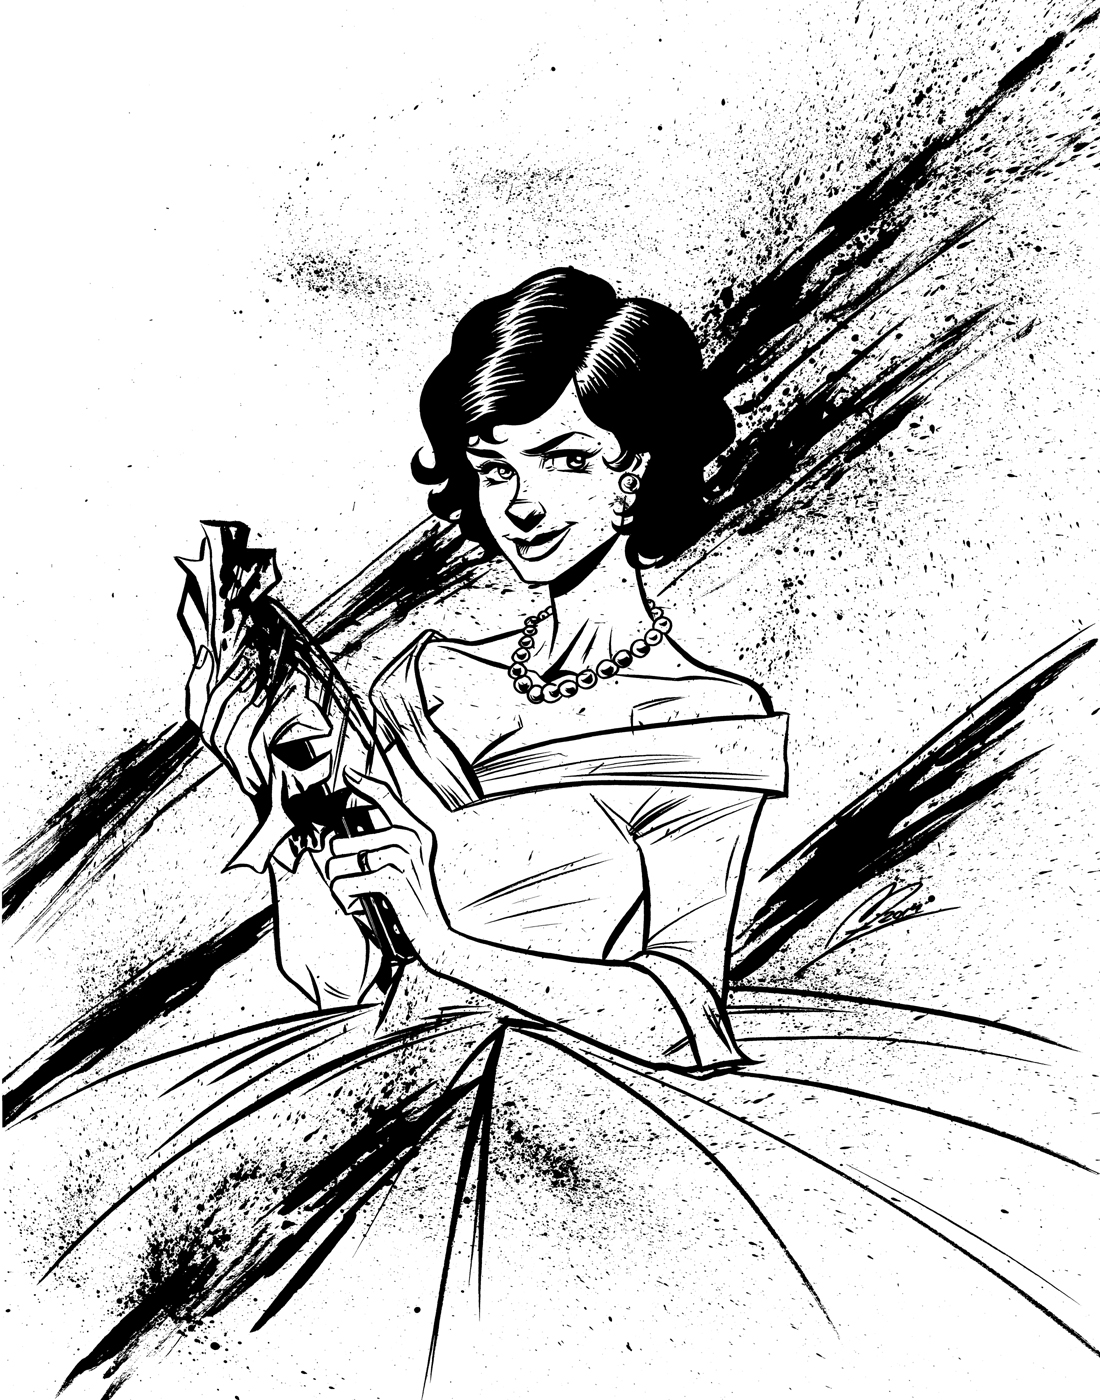 Josie from Lady Killer